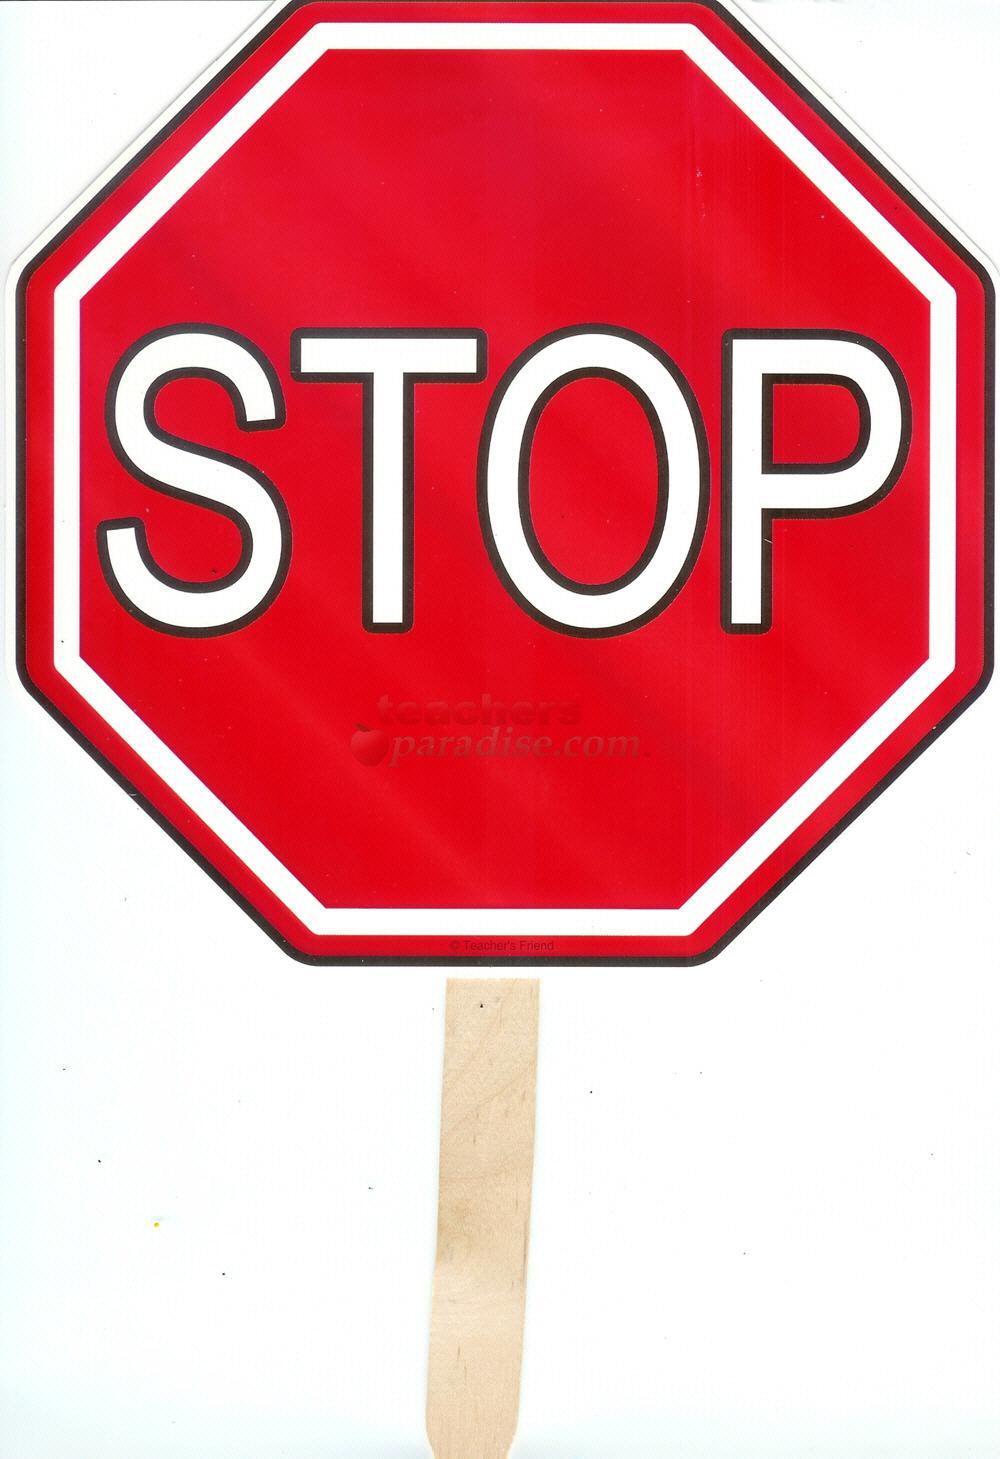 stop sign clipart clipart panda free clipart images rh clipartpanda com microsoft clipart stop sign clip art stop sign black and white